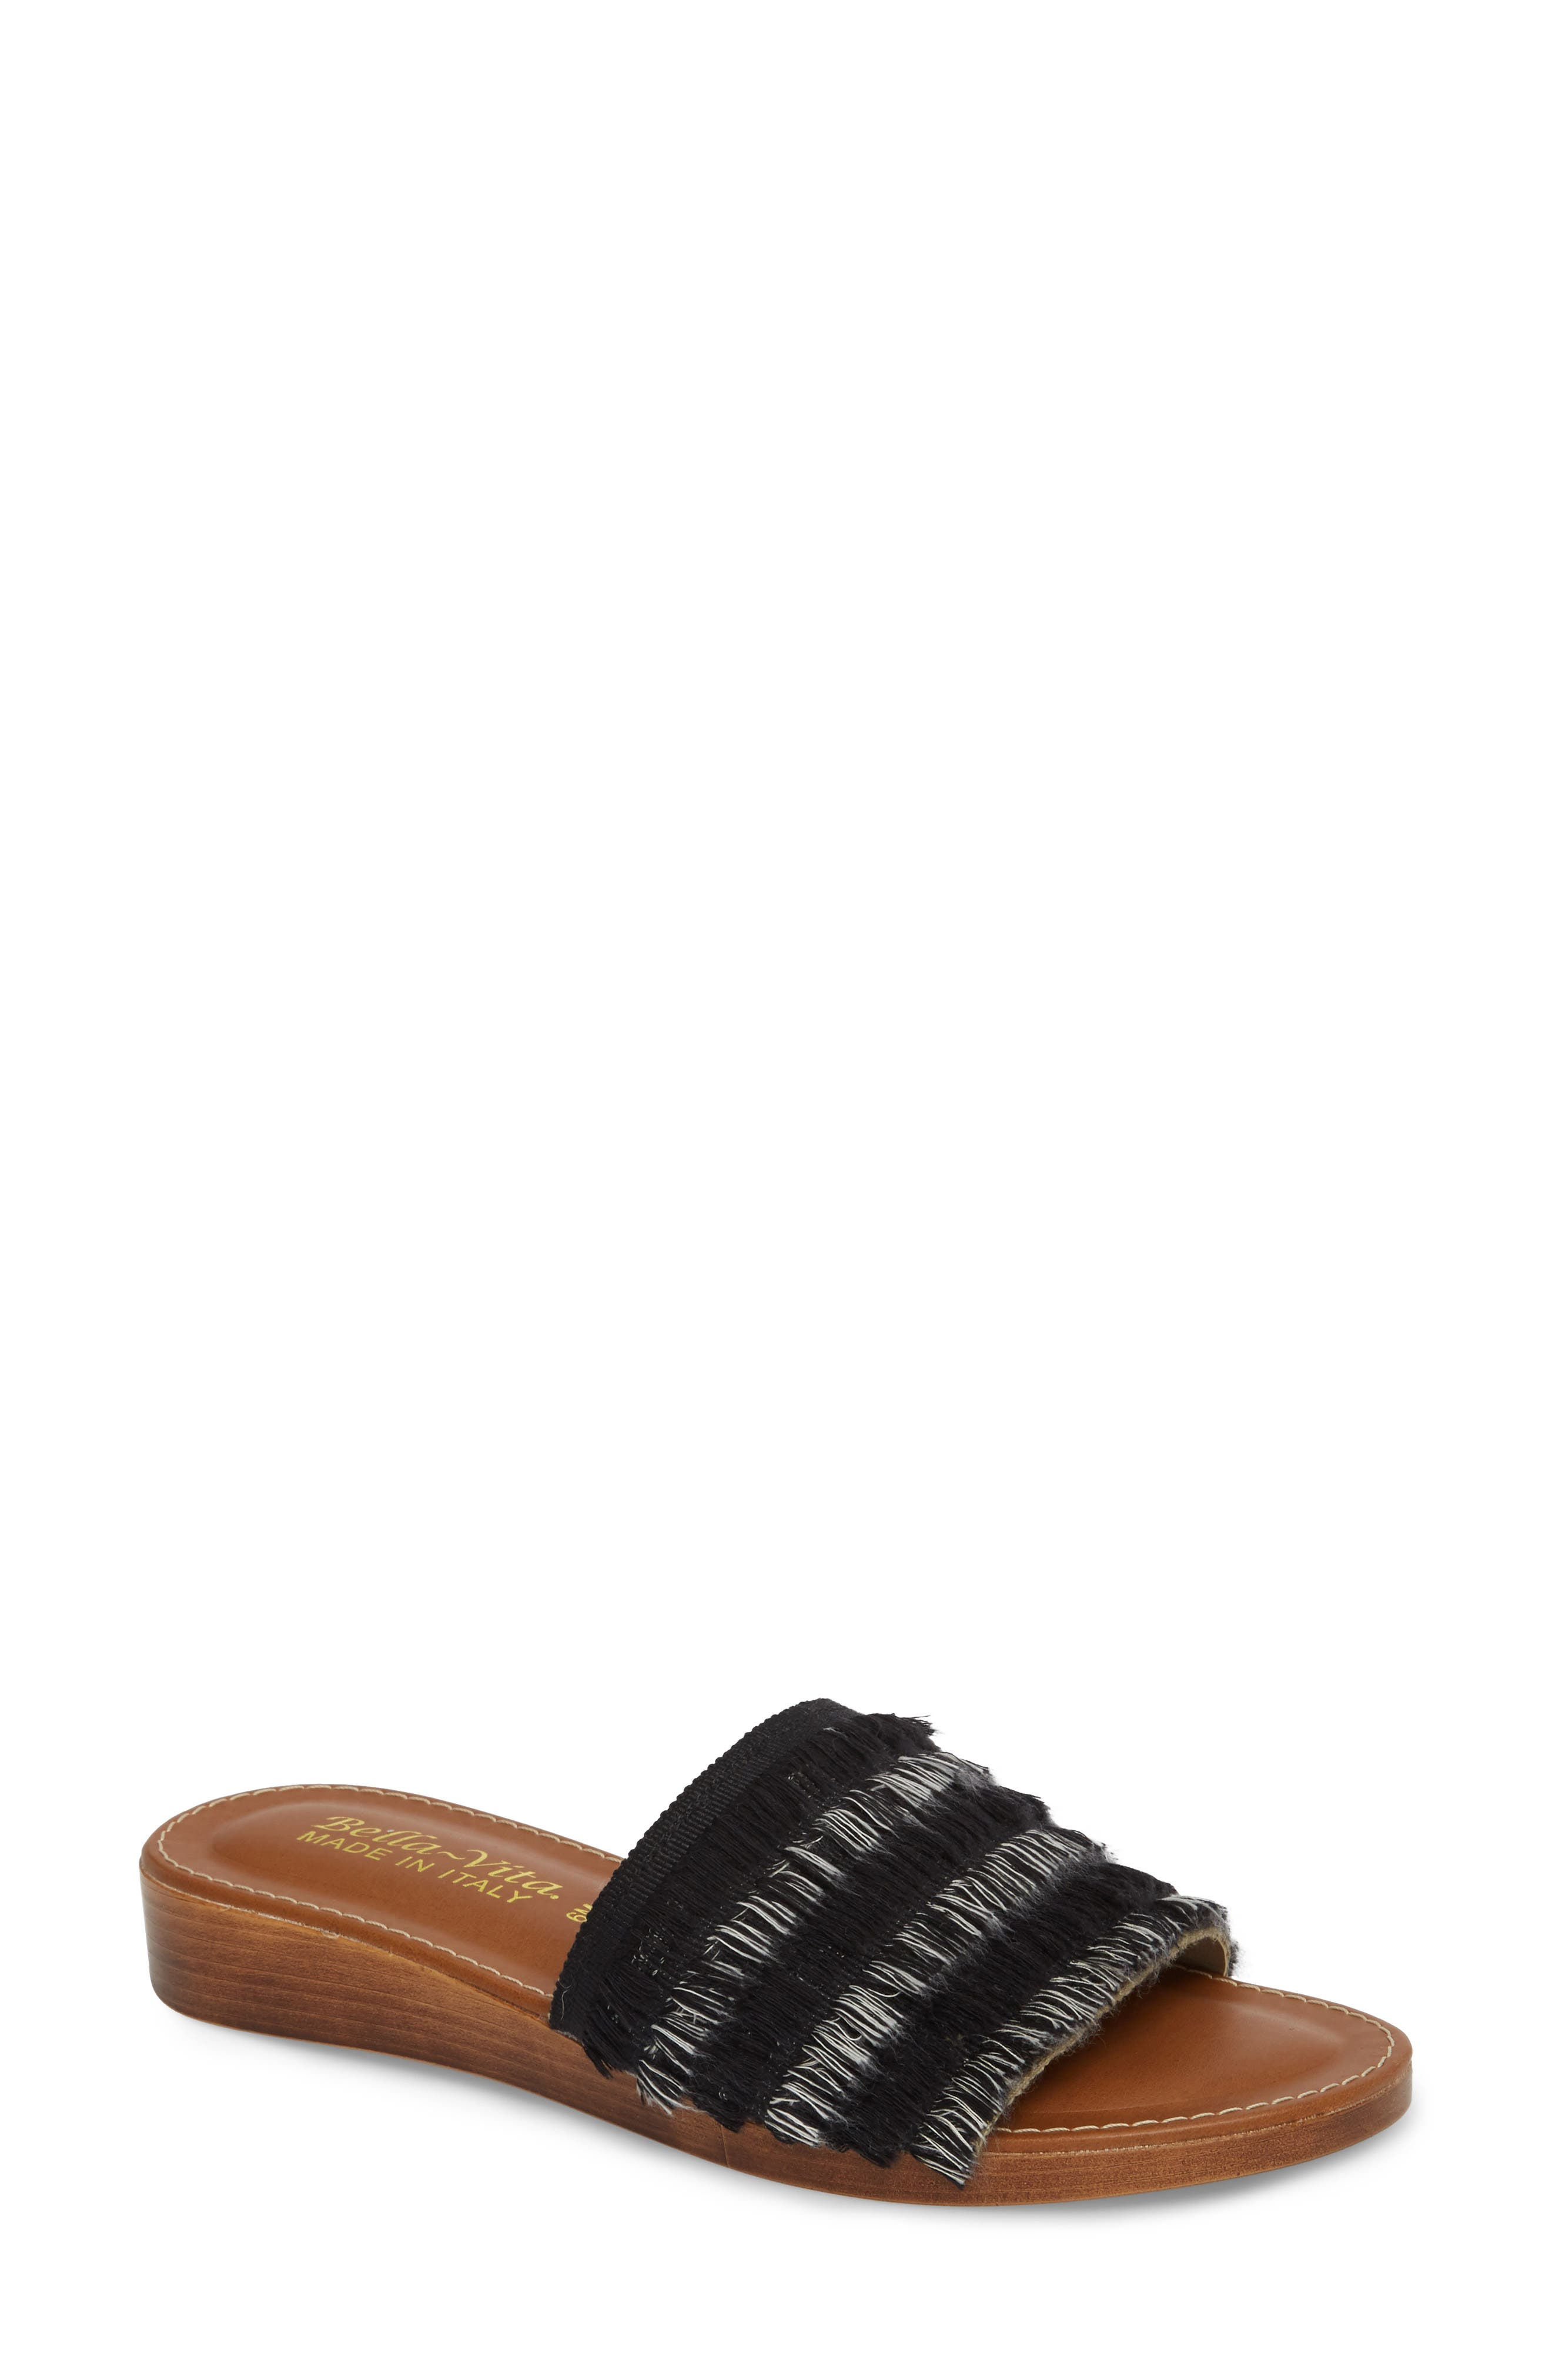 Abi Slide Sandal,                         Main,                         color,